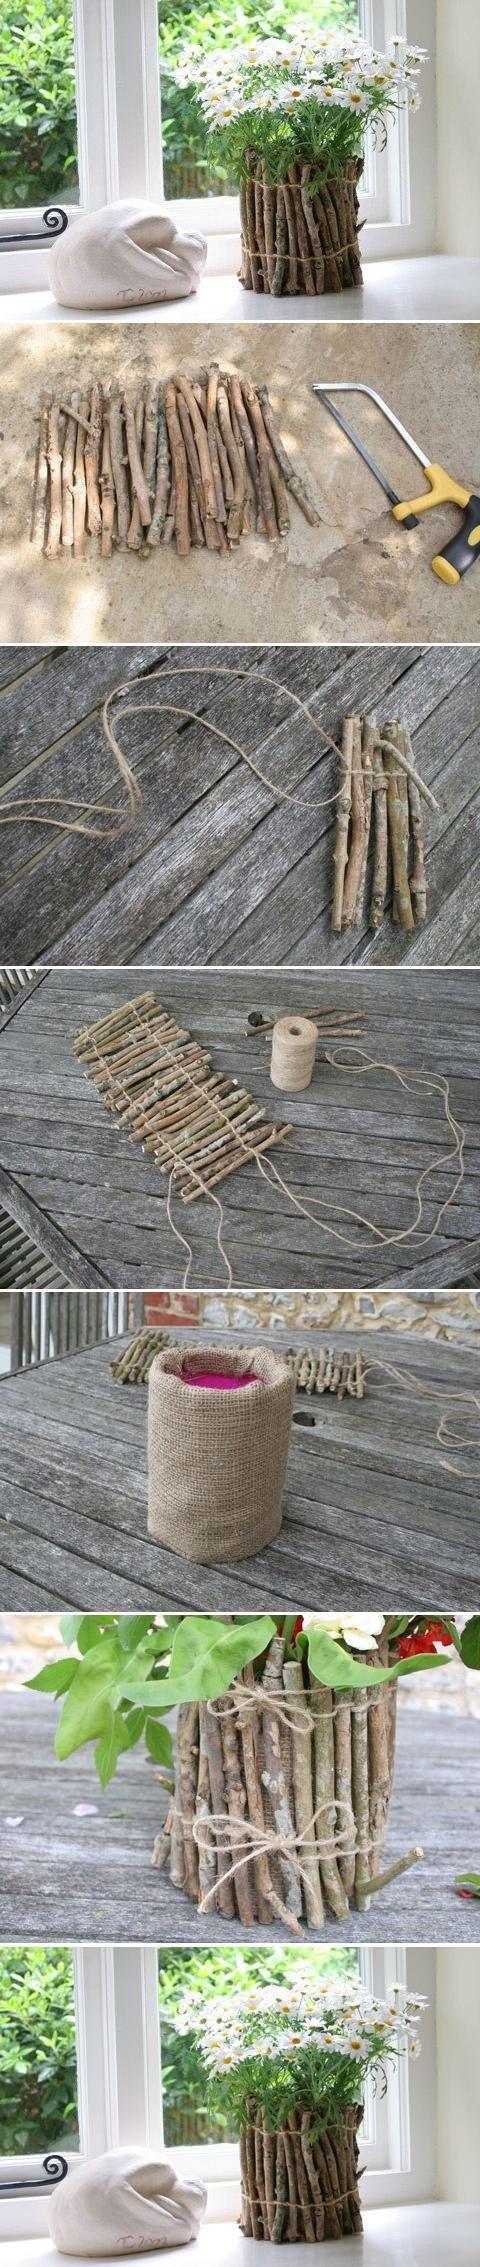 DIY Tree Branches Flower Pot DIY Projects | UsefulDIY.com